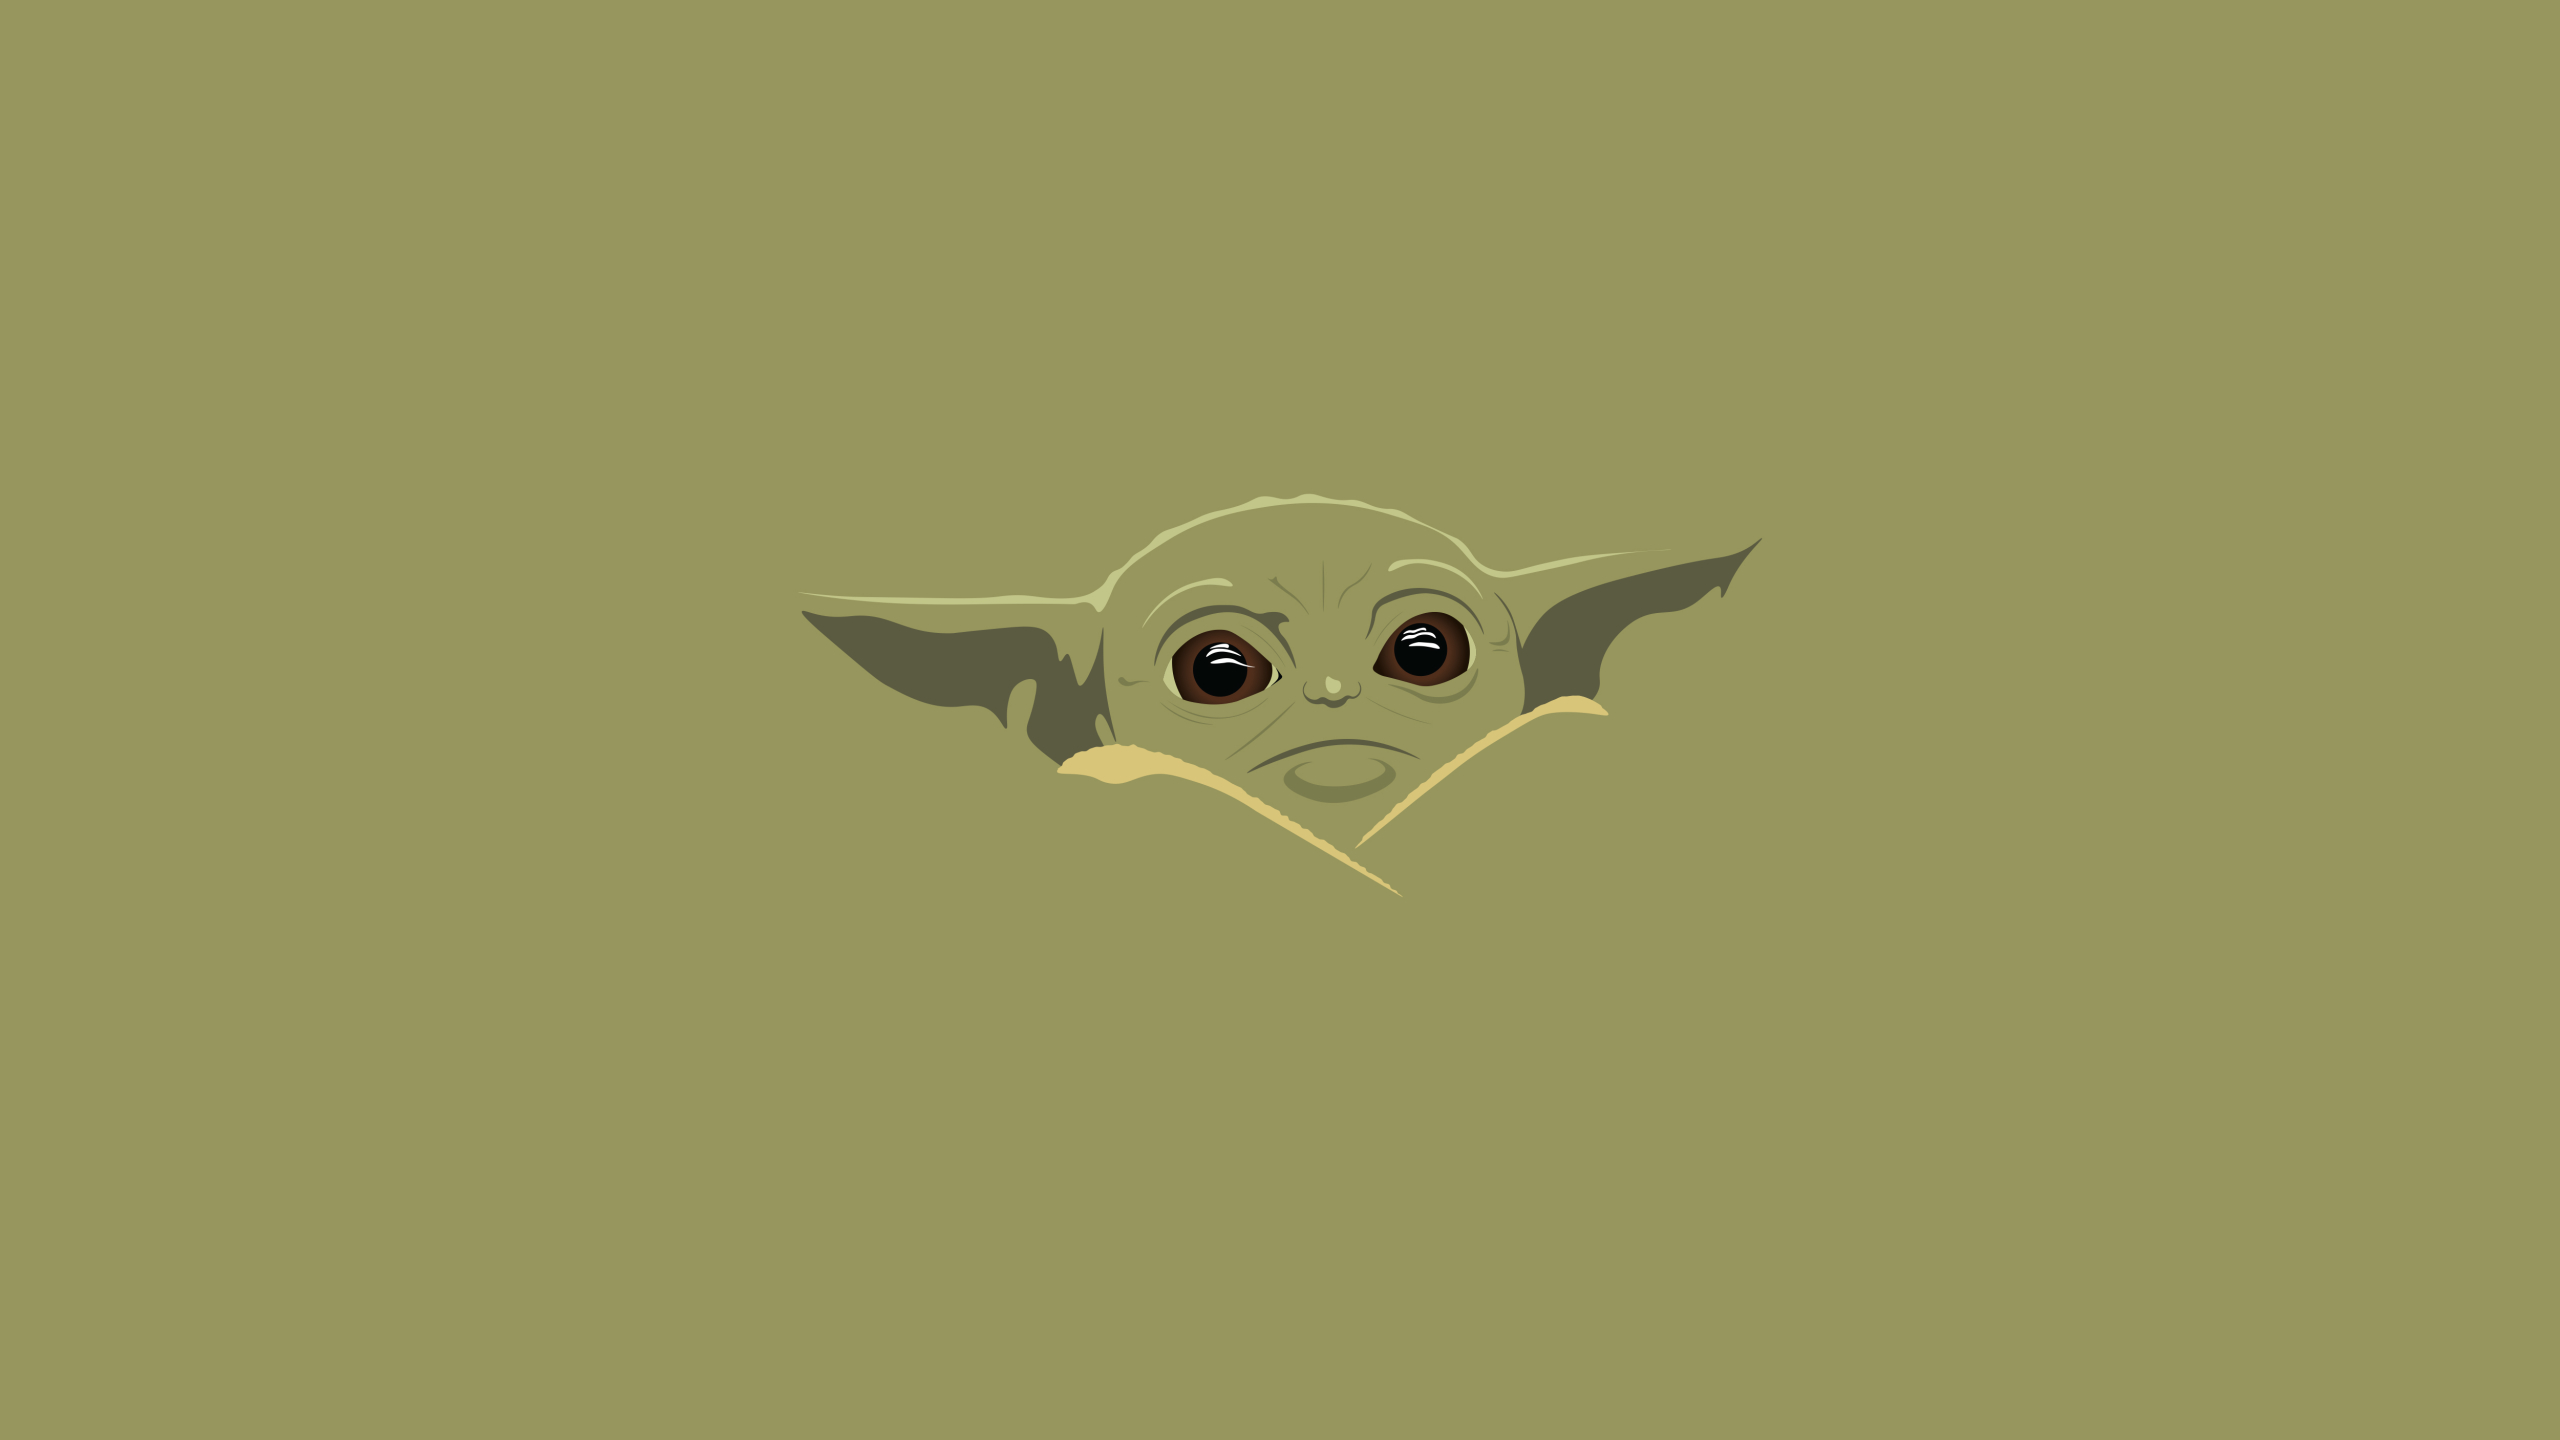 2560x1440 Yoda Baby Minimal Art 1440P Resolution Wallpaper ...